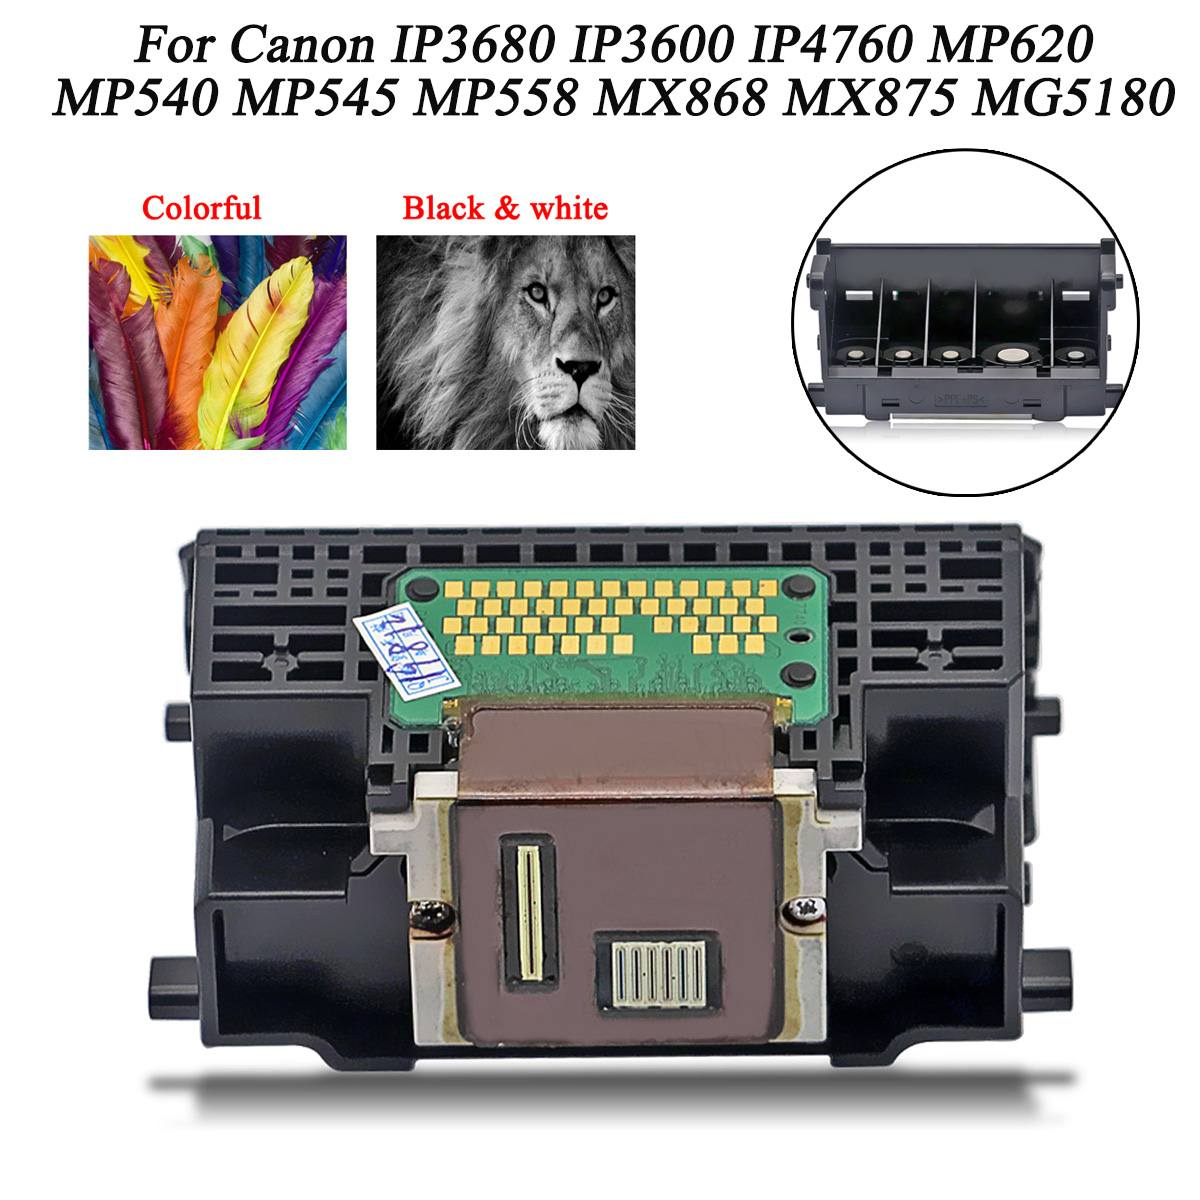 LEORY Printhead QY6-0073 Printer Head Print Head Printer Parts Accessories For Canon IP3600 IP3600 MP540 MP558 MX875 MX868 MG518